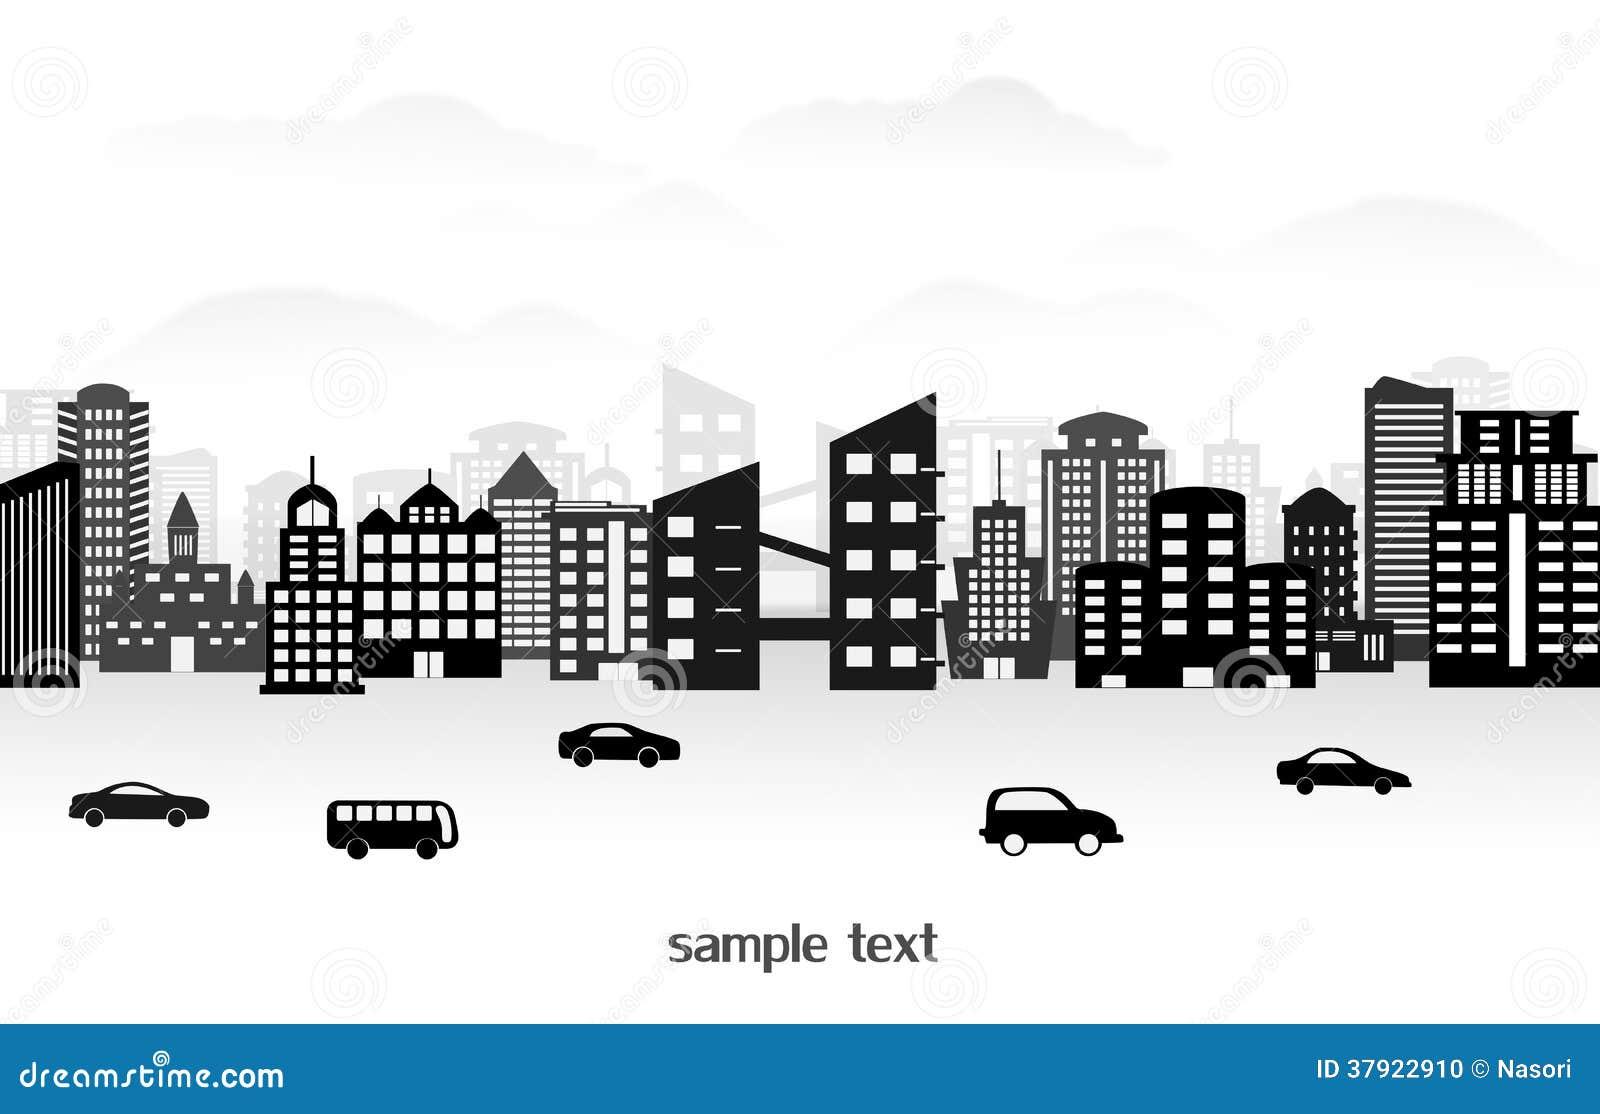 Town Landscape Vector Illustration: City Landscape Stock Vector. Illustration Of Town, Window